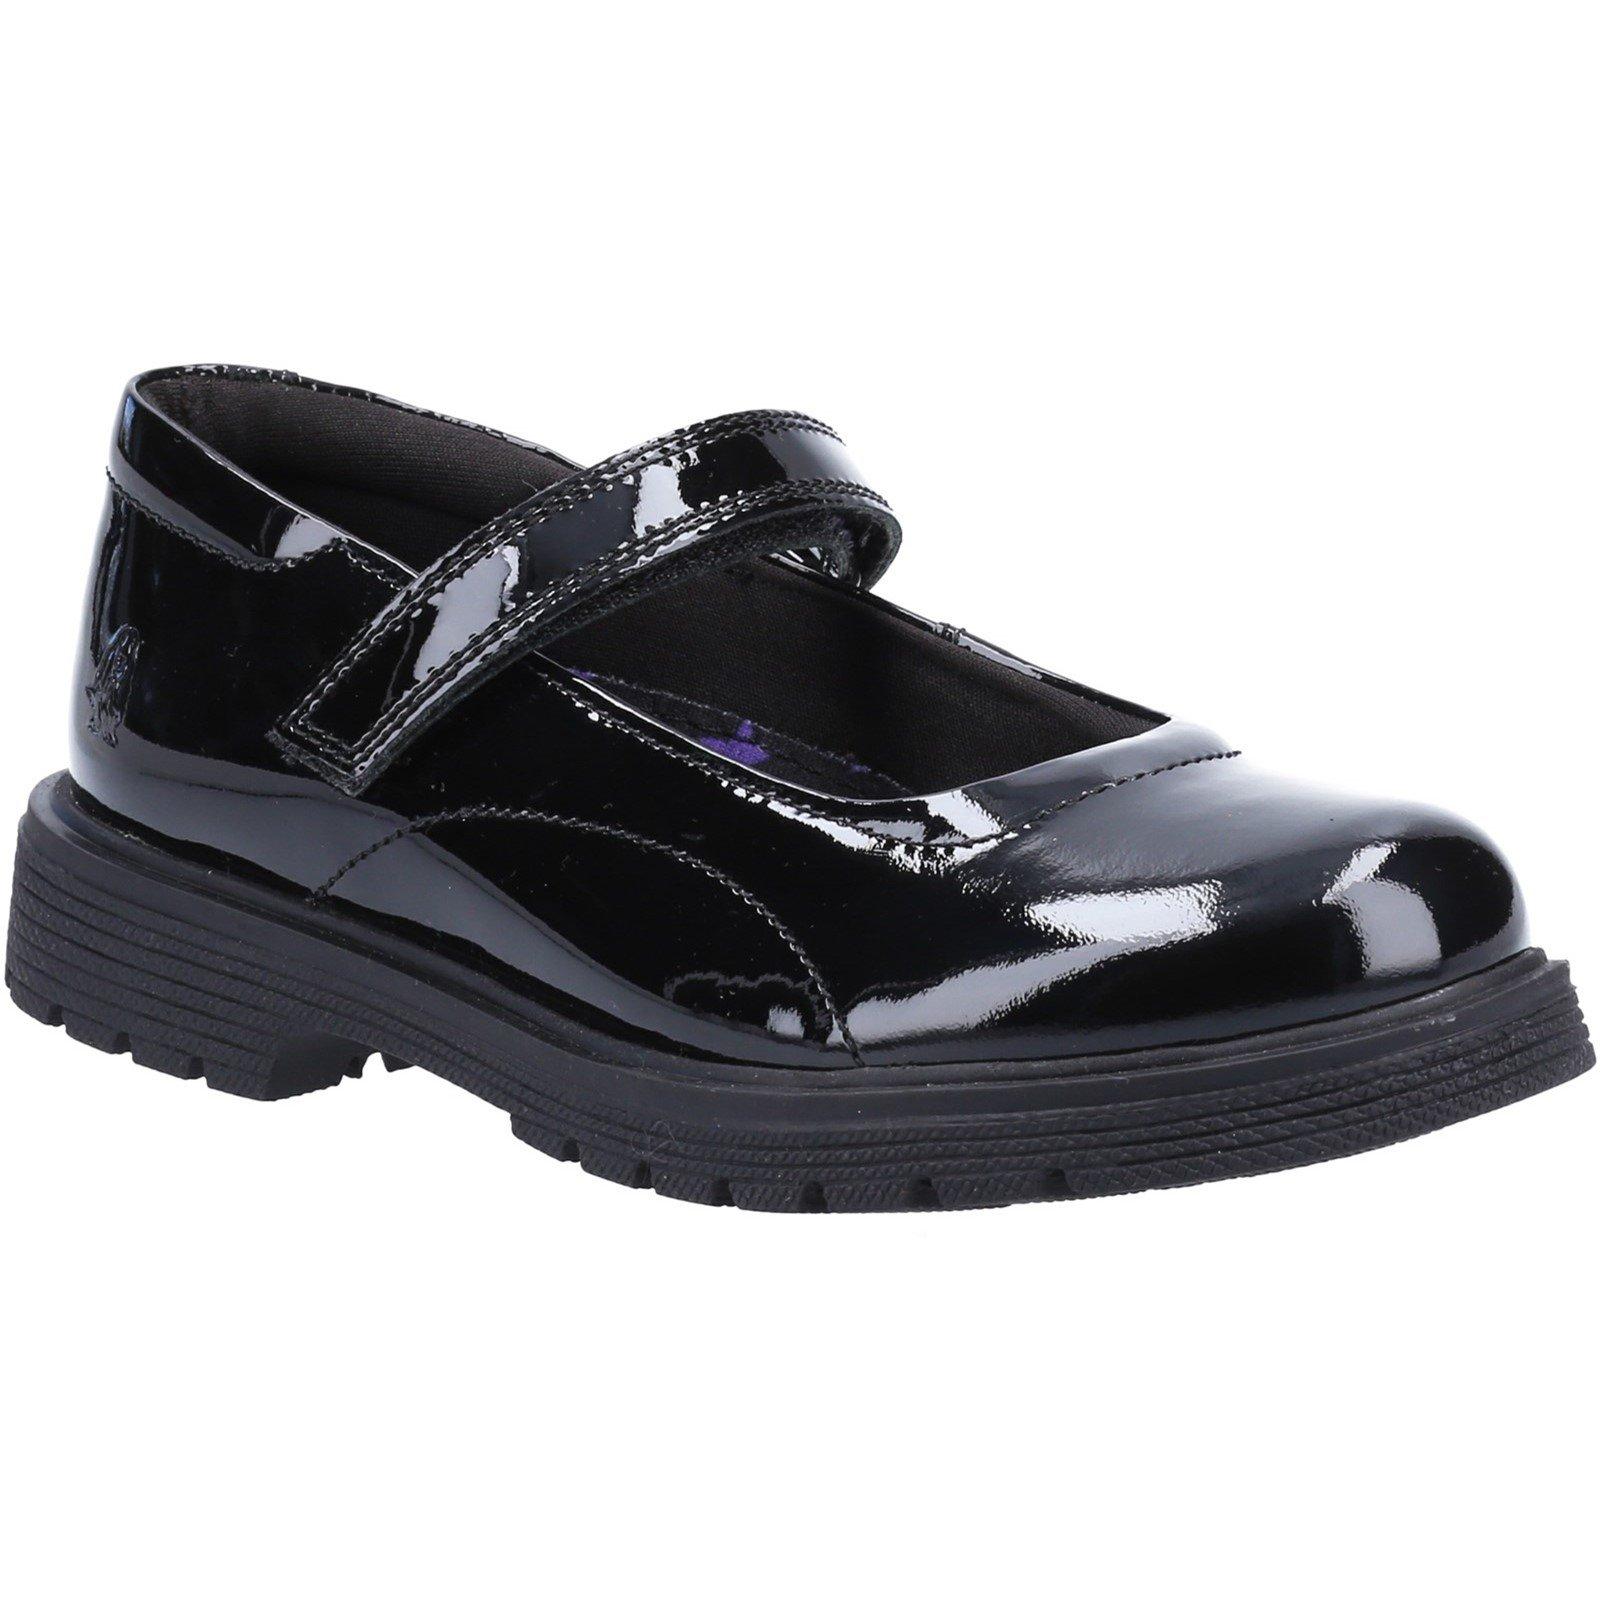 Hush Puppies Kid's Tally Junior School Shoe Patent Black 32814 - Patent Black 10